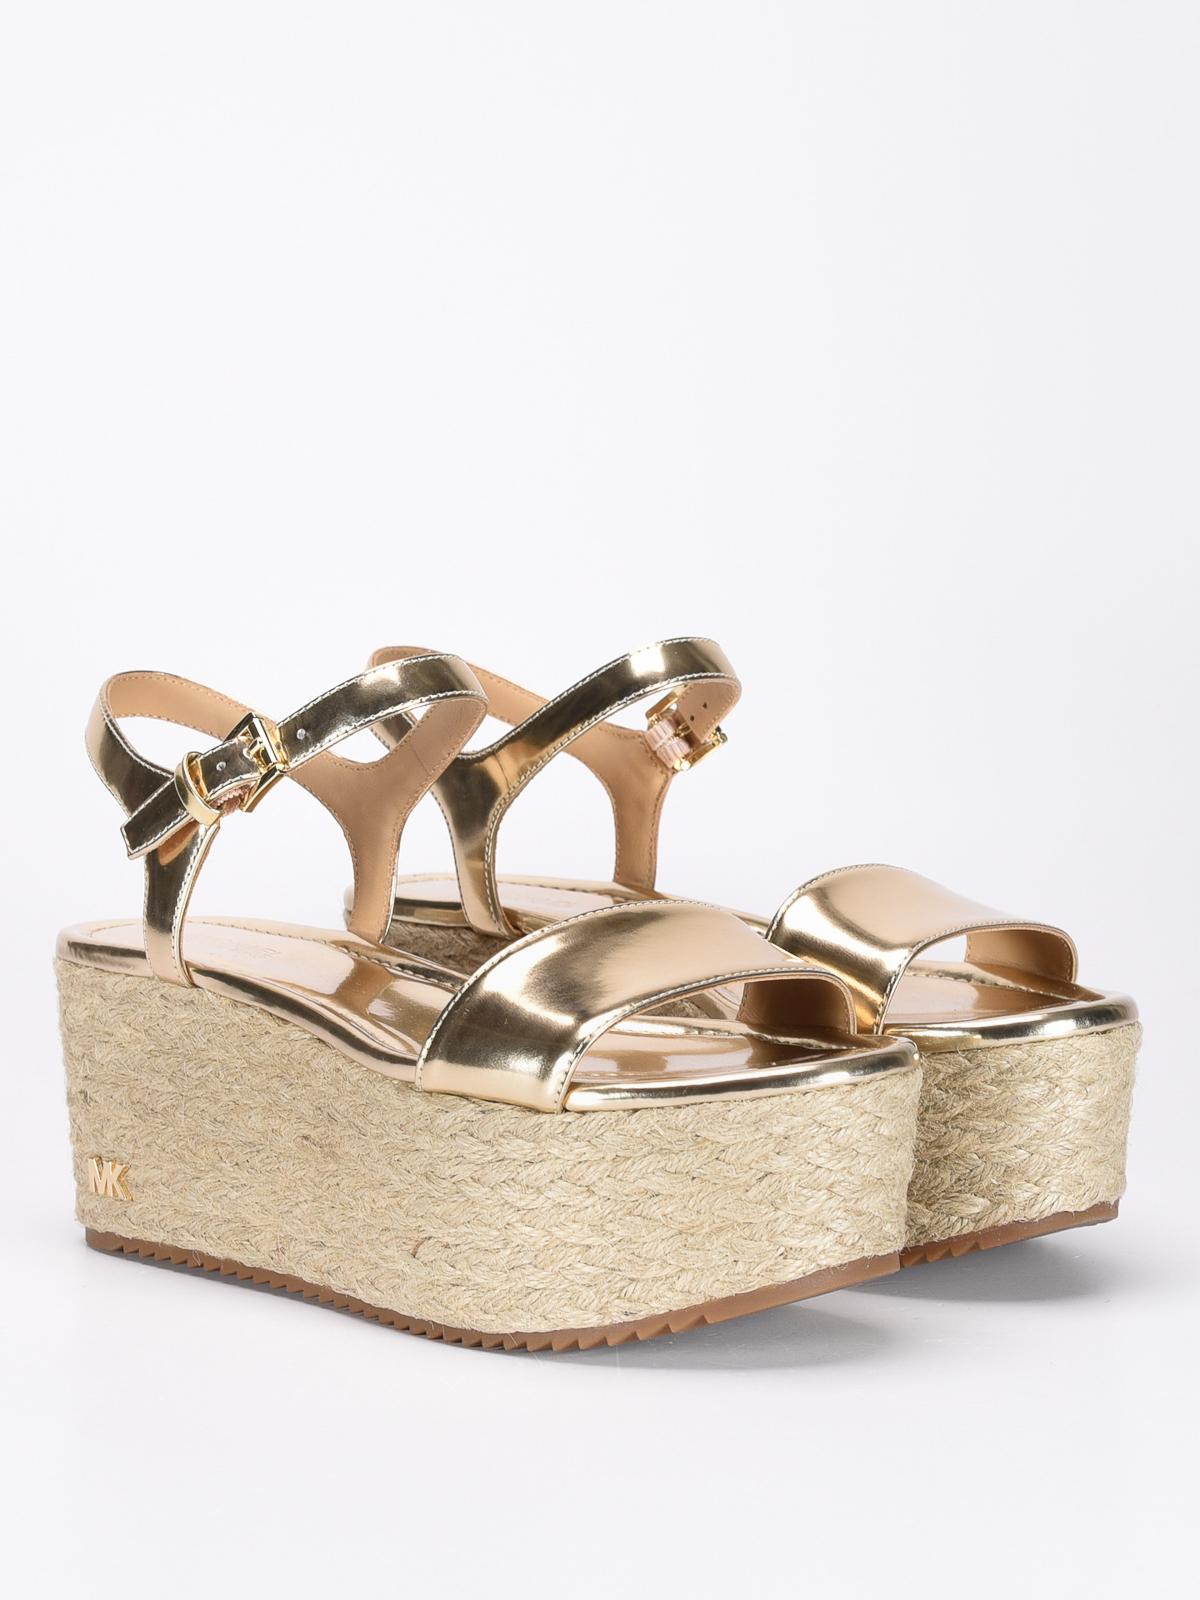 22f186acf88 Michael Kors - Nantucket wedge sandals - sandals - 40SNAFA3M